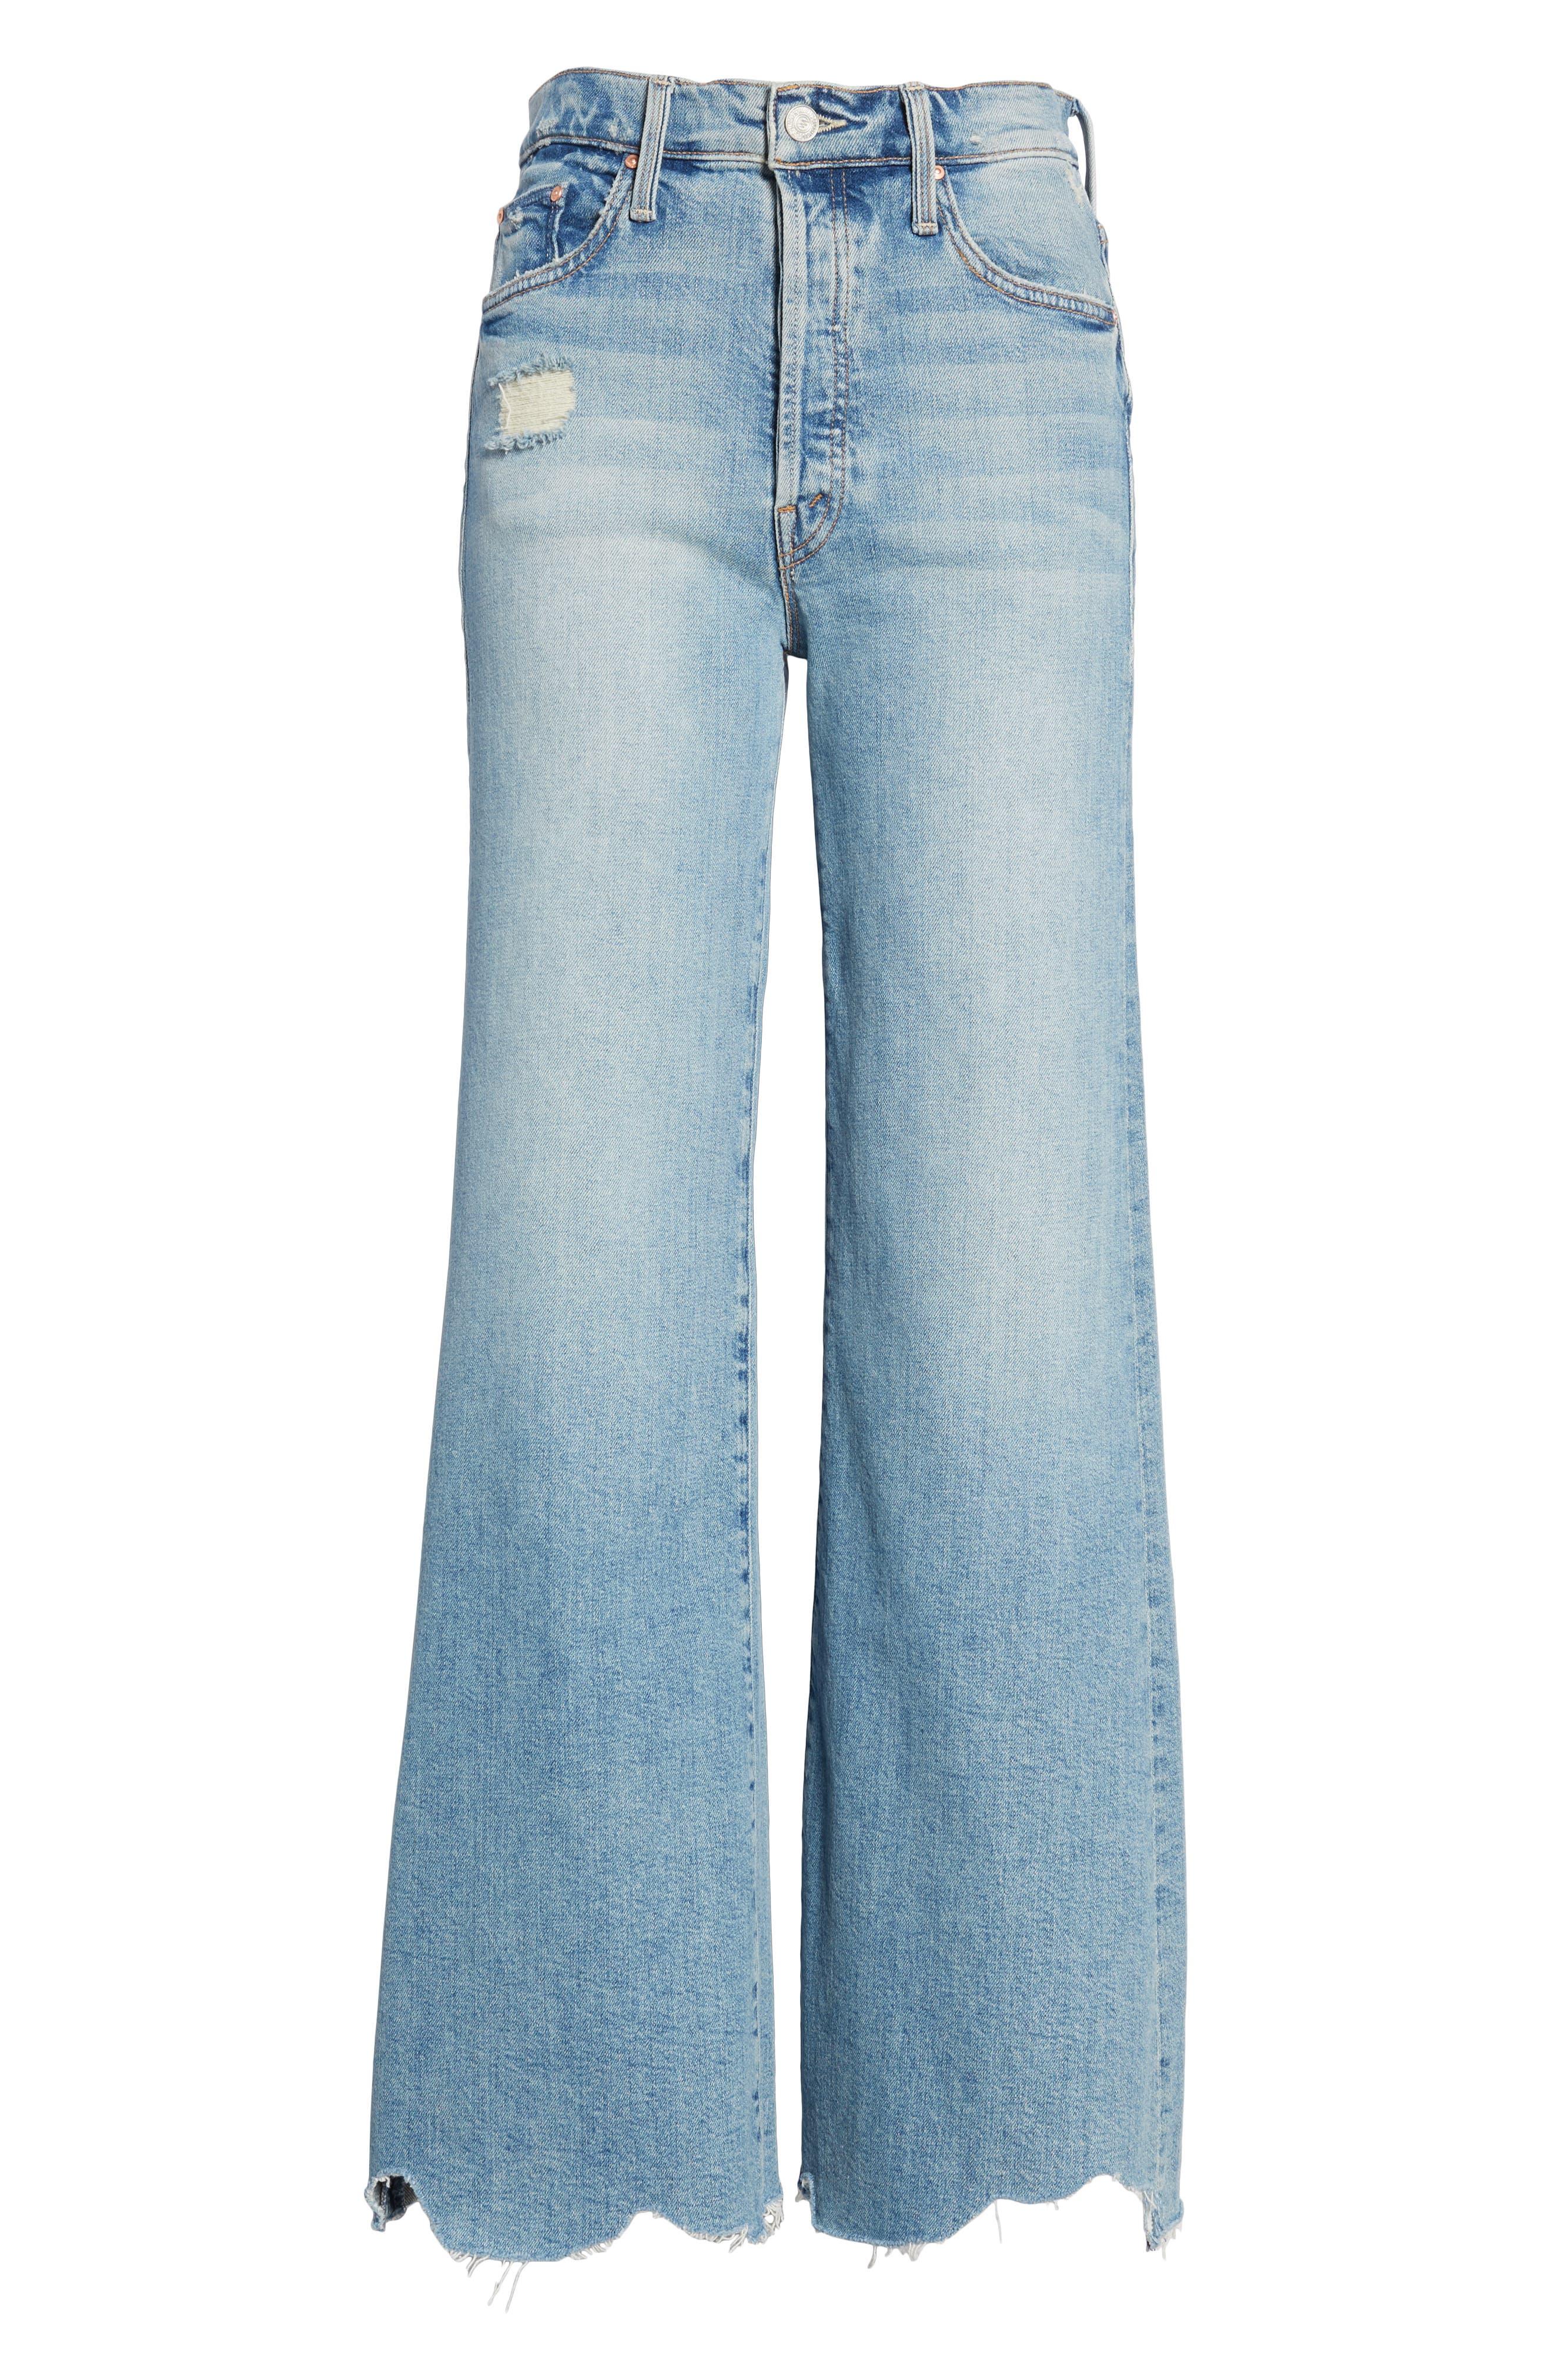 Tomcat Roller Chew Hem Jeans,                             Alternate thumbnail 7, color,                             420